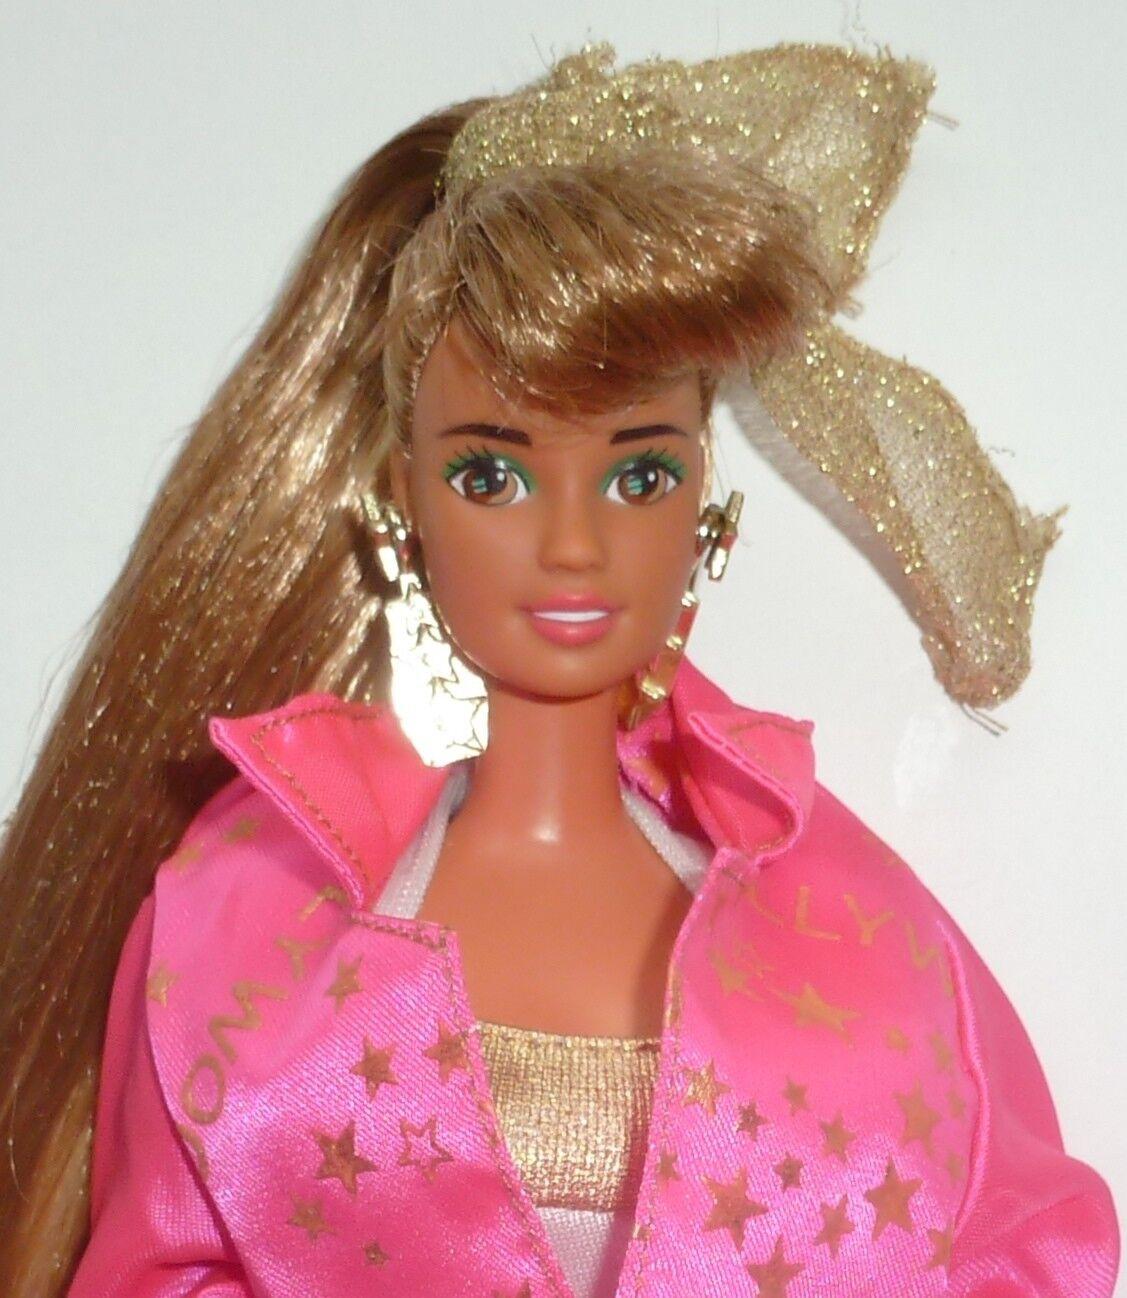 SUPER RARA VINTAGE 1990 Hollywood Capelli Bambola  Barbie Teresa, Moda & ste.  ordina adesso